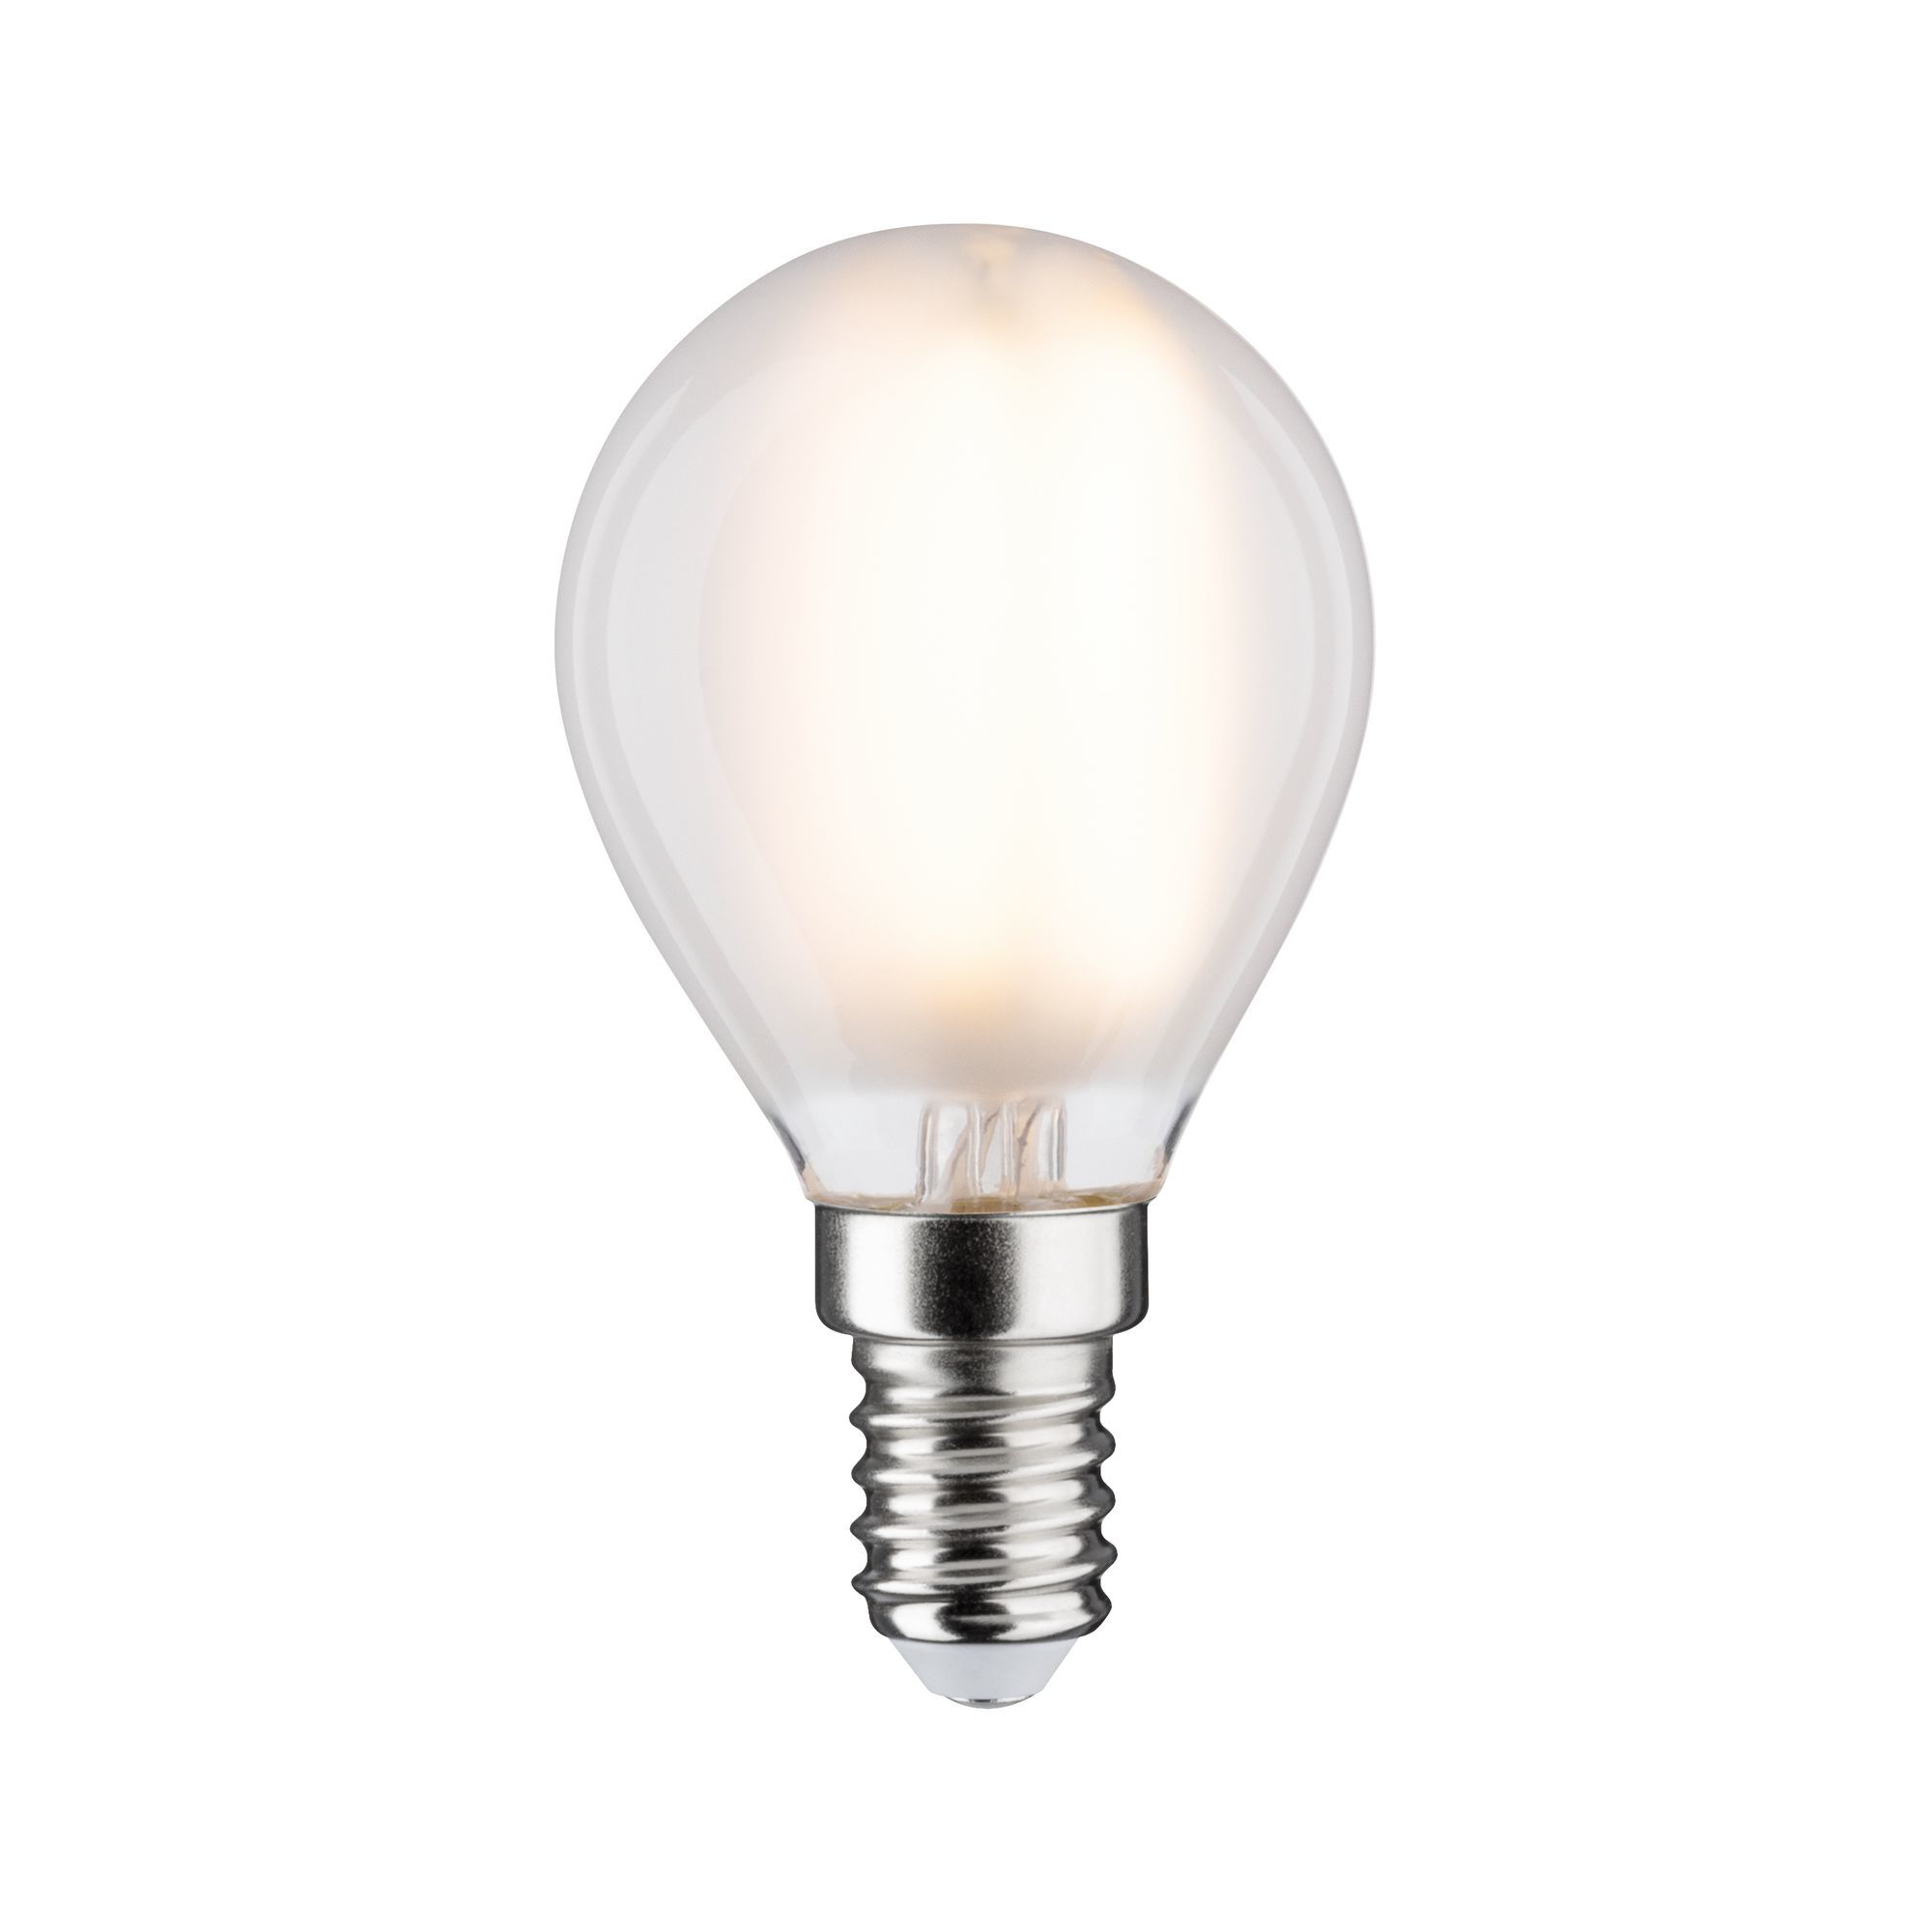 Paulmann LED Fil Tropfen 806lm E14 2700K 6,5W matt 230V (28652)